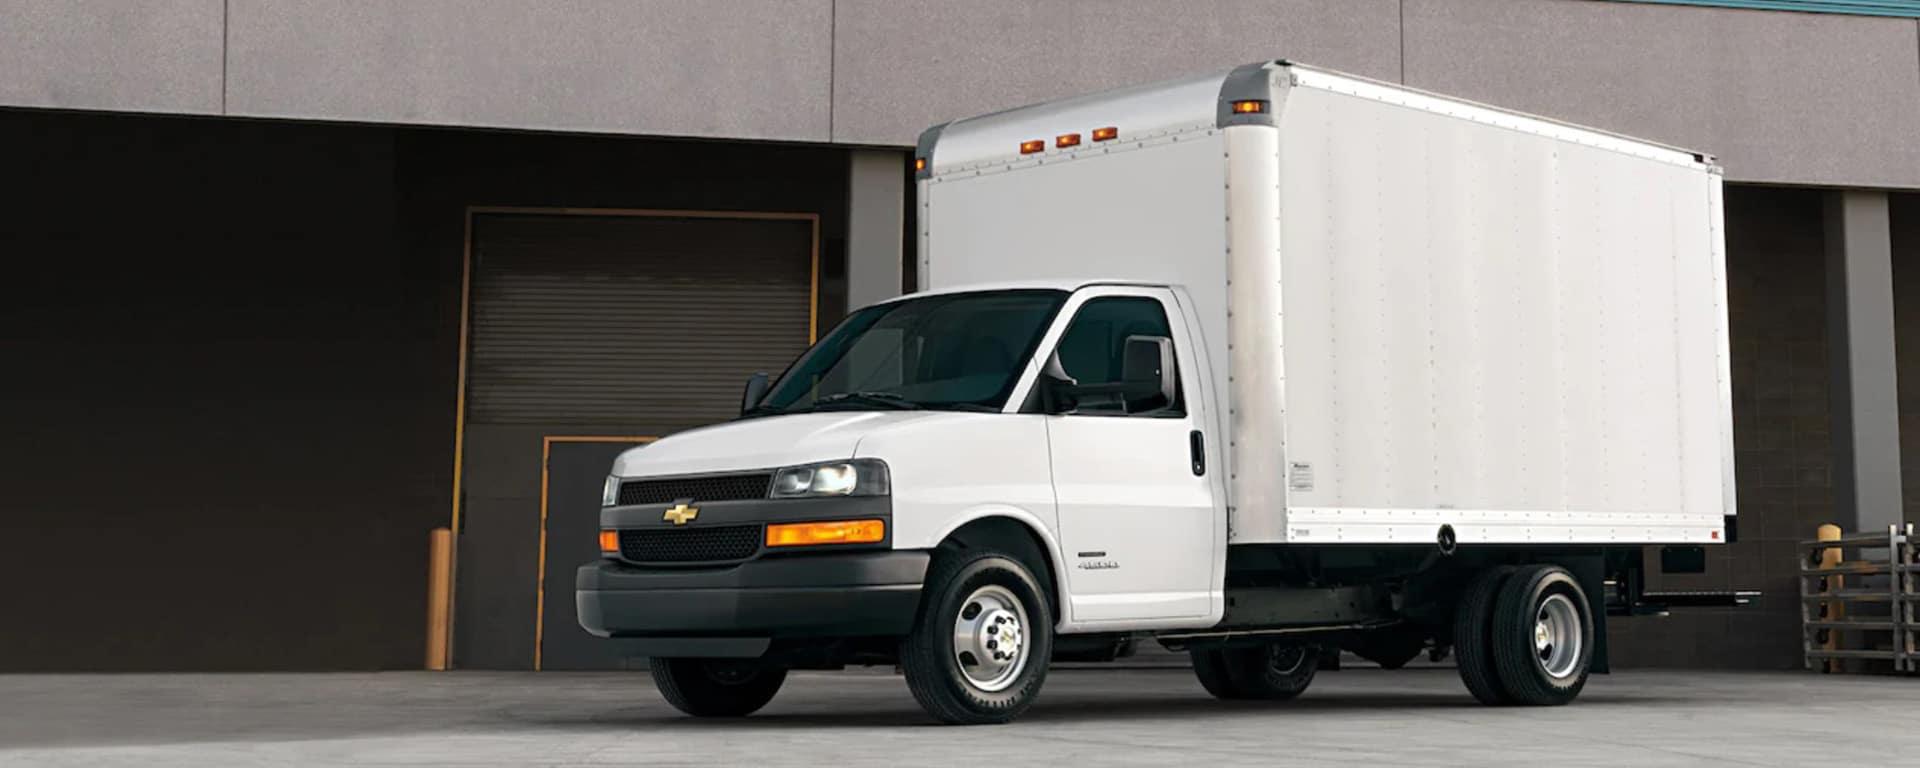 2021 Chevrolet Express Cutaway near me